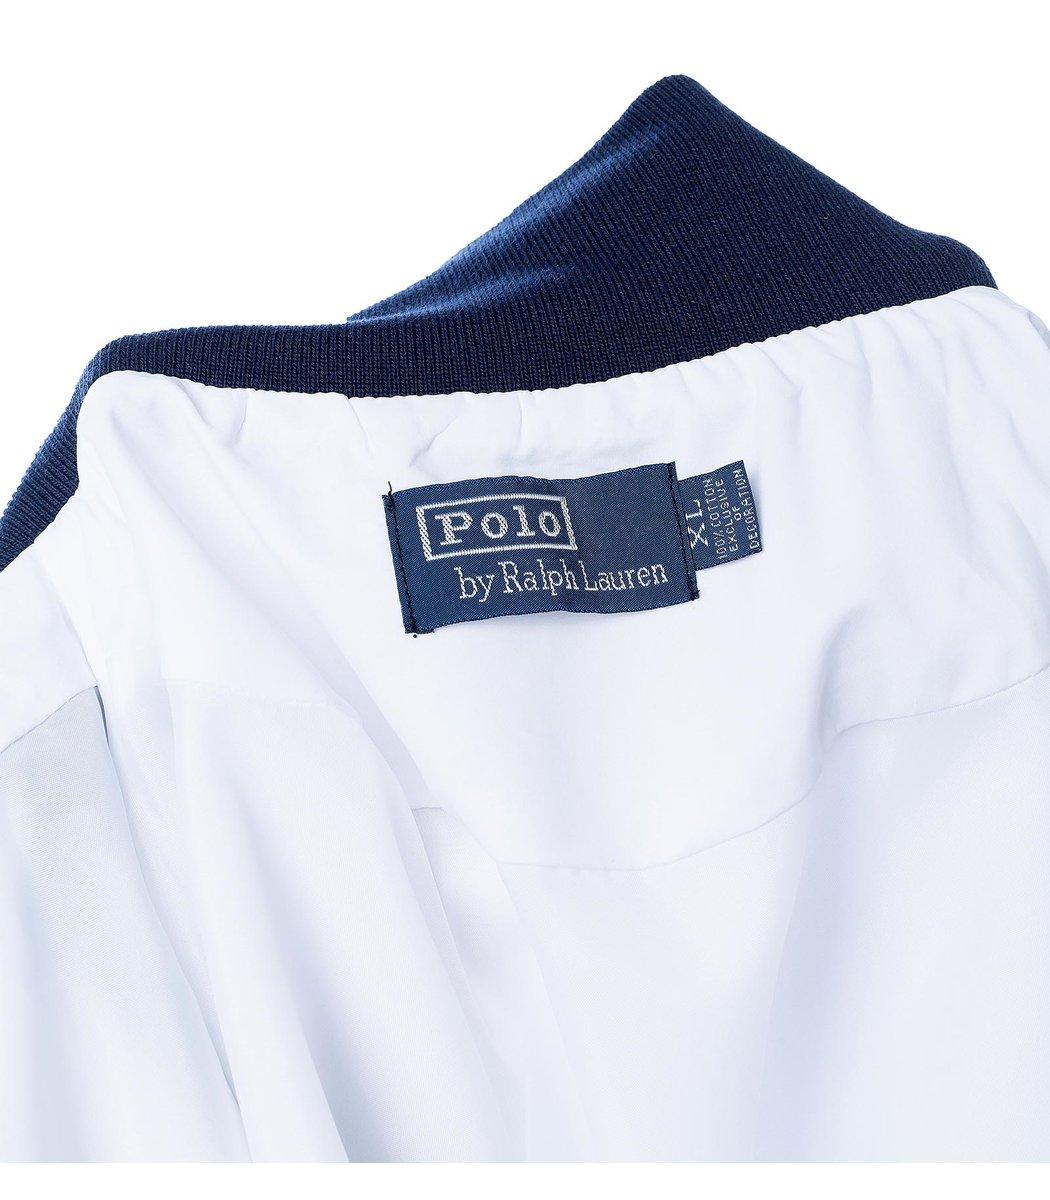 Спортивный костюм POLO Ralph Lauren Classic Белый/темно-синий - Белый - Вид 9